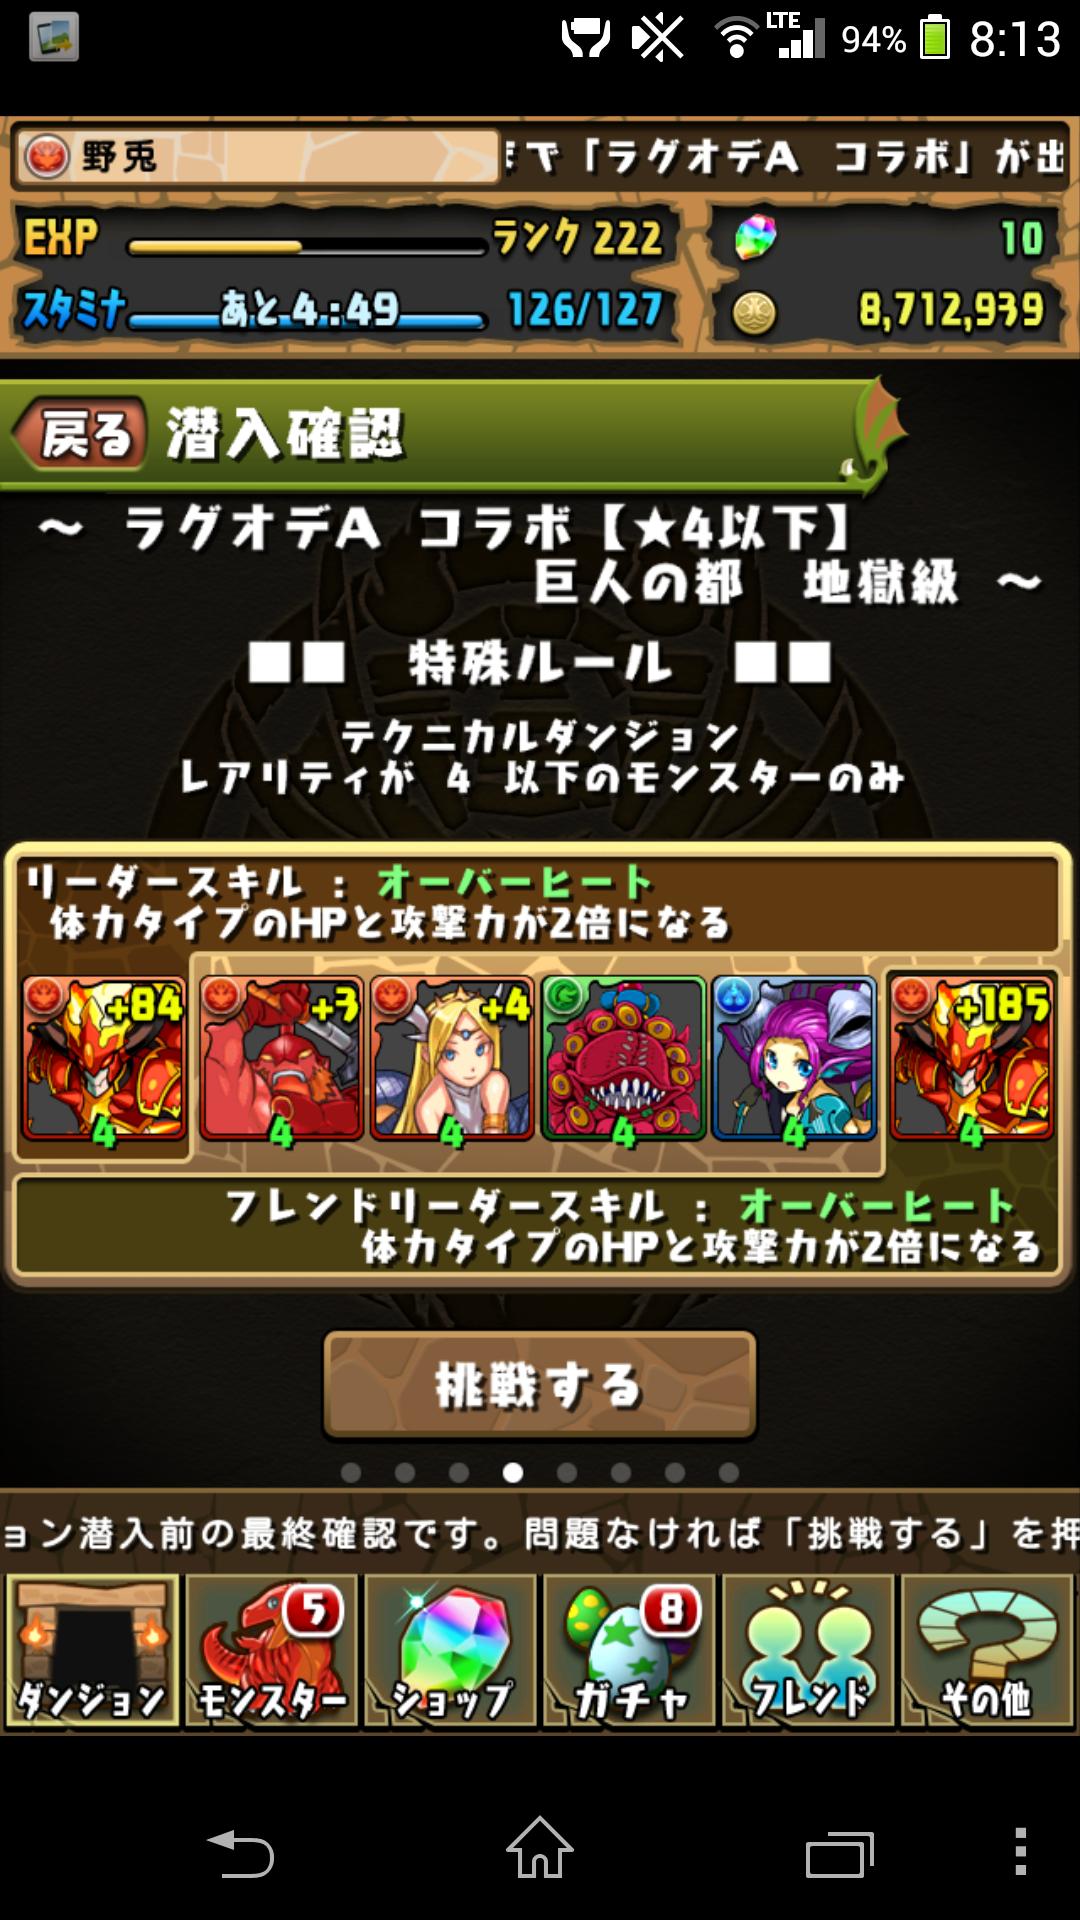 Screenshot_2014-04-04-08-13-44.png